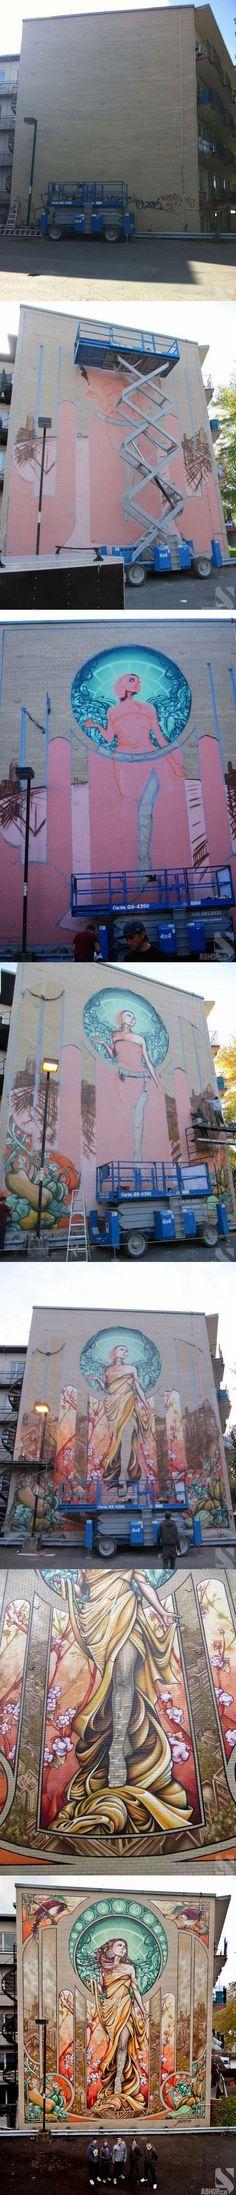 Urban improvement via organized graffiti walls: beautification, holmes